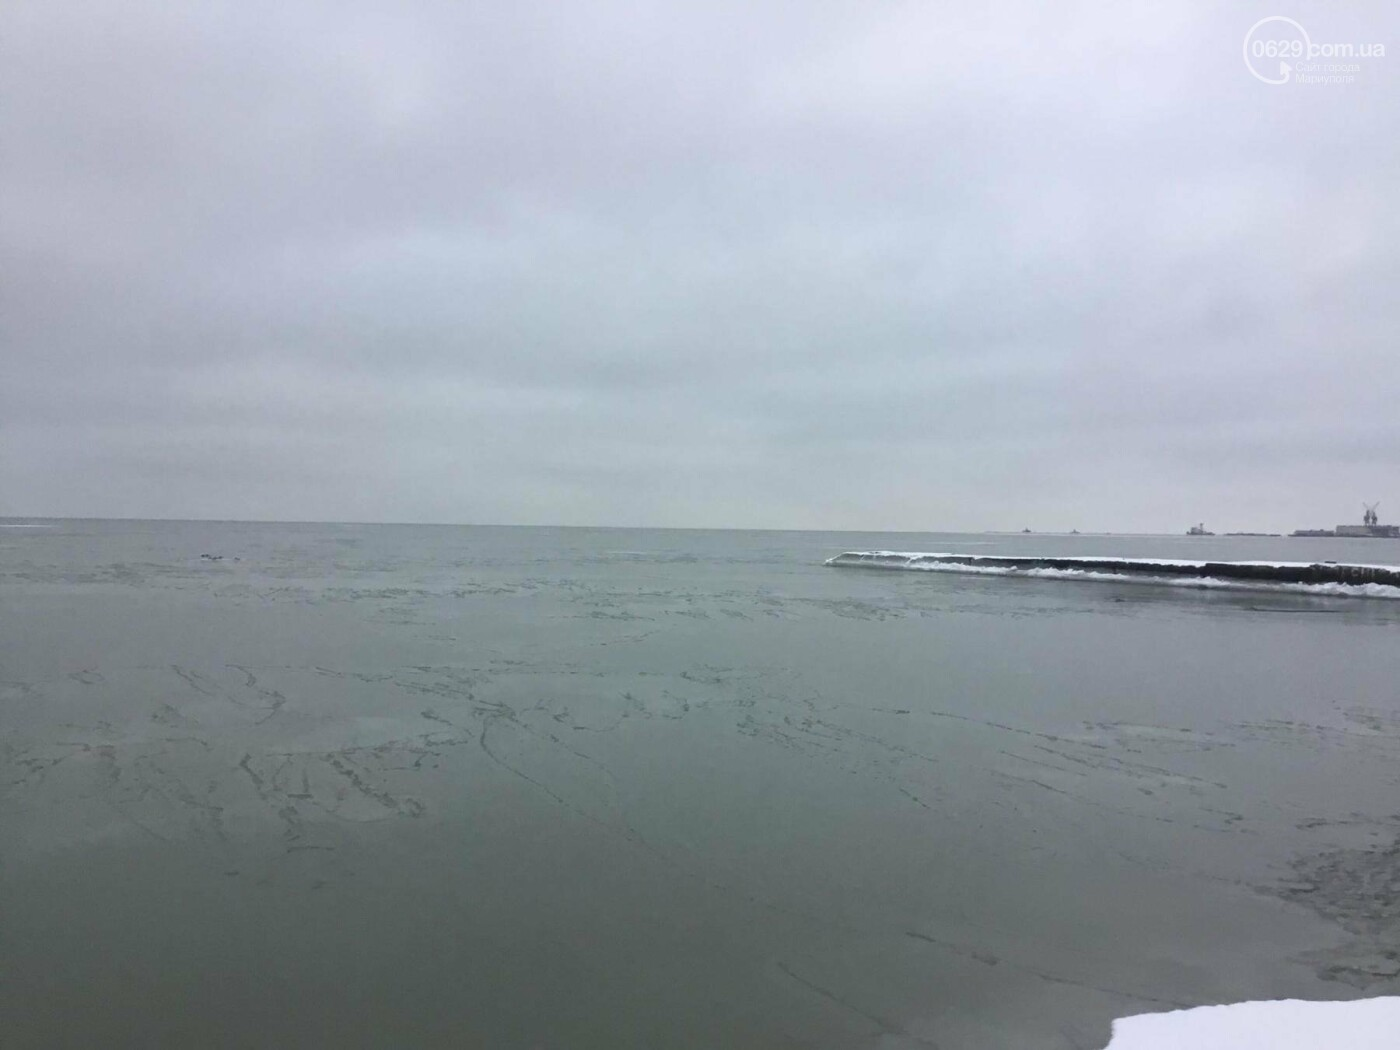 В Мариуполе на море появилась ледяная корка (Фотофакт), фото-1